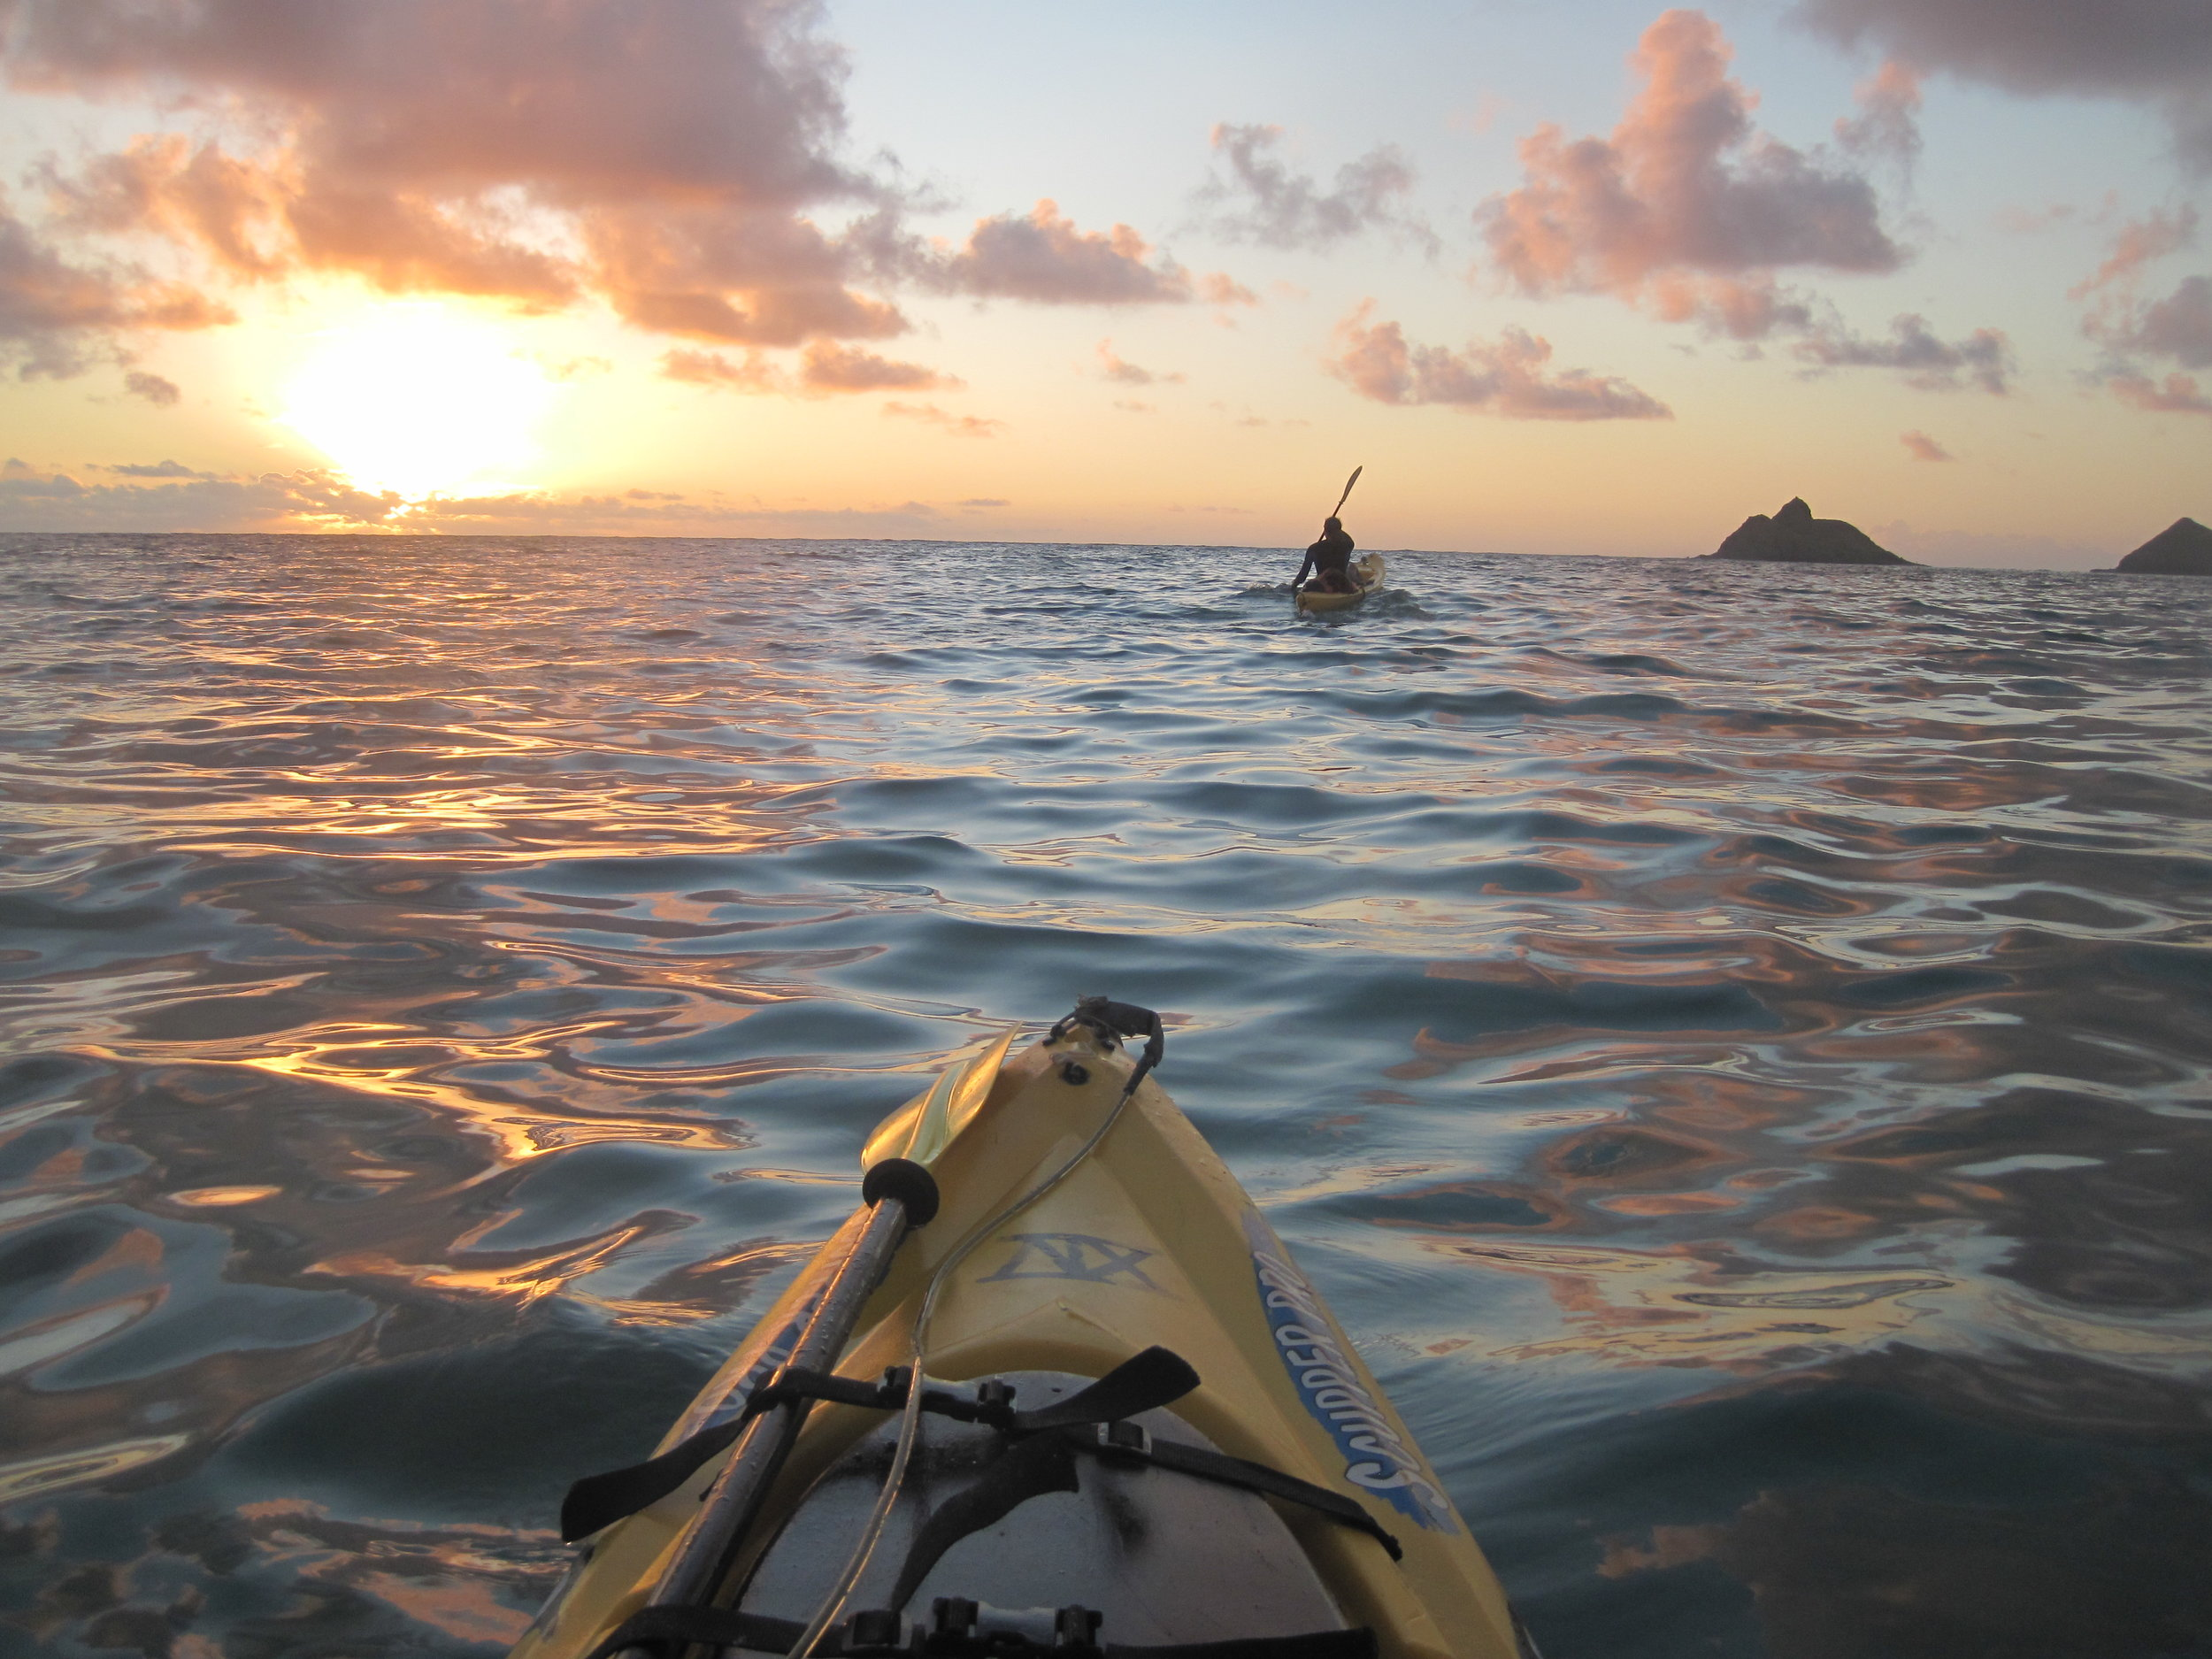 Sunrise by The Mokulua Islands